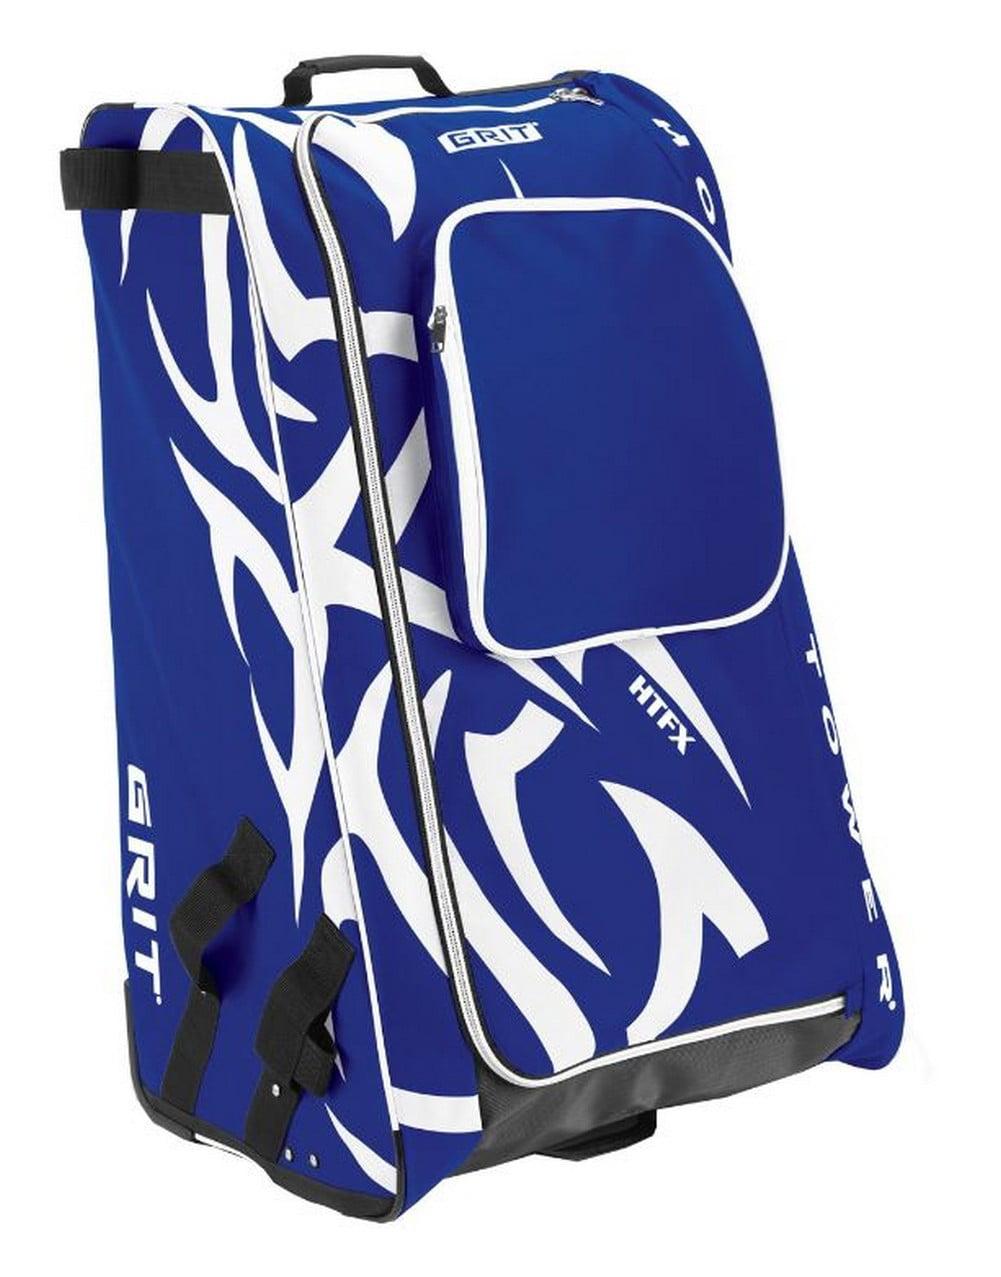 "Grit Inc HTFX Hockey Tower 33"" Wheeled Equipment Bag Royal HTFX033-TO (Toronto) by Grit Inc."